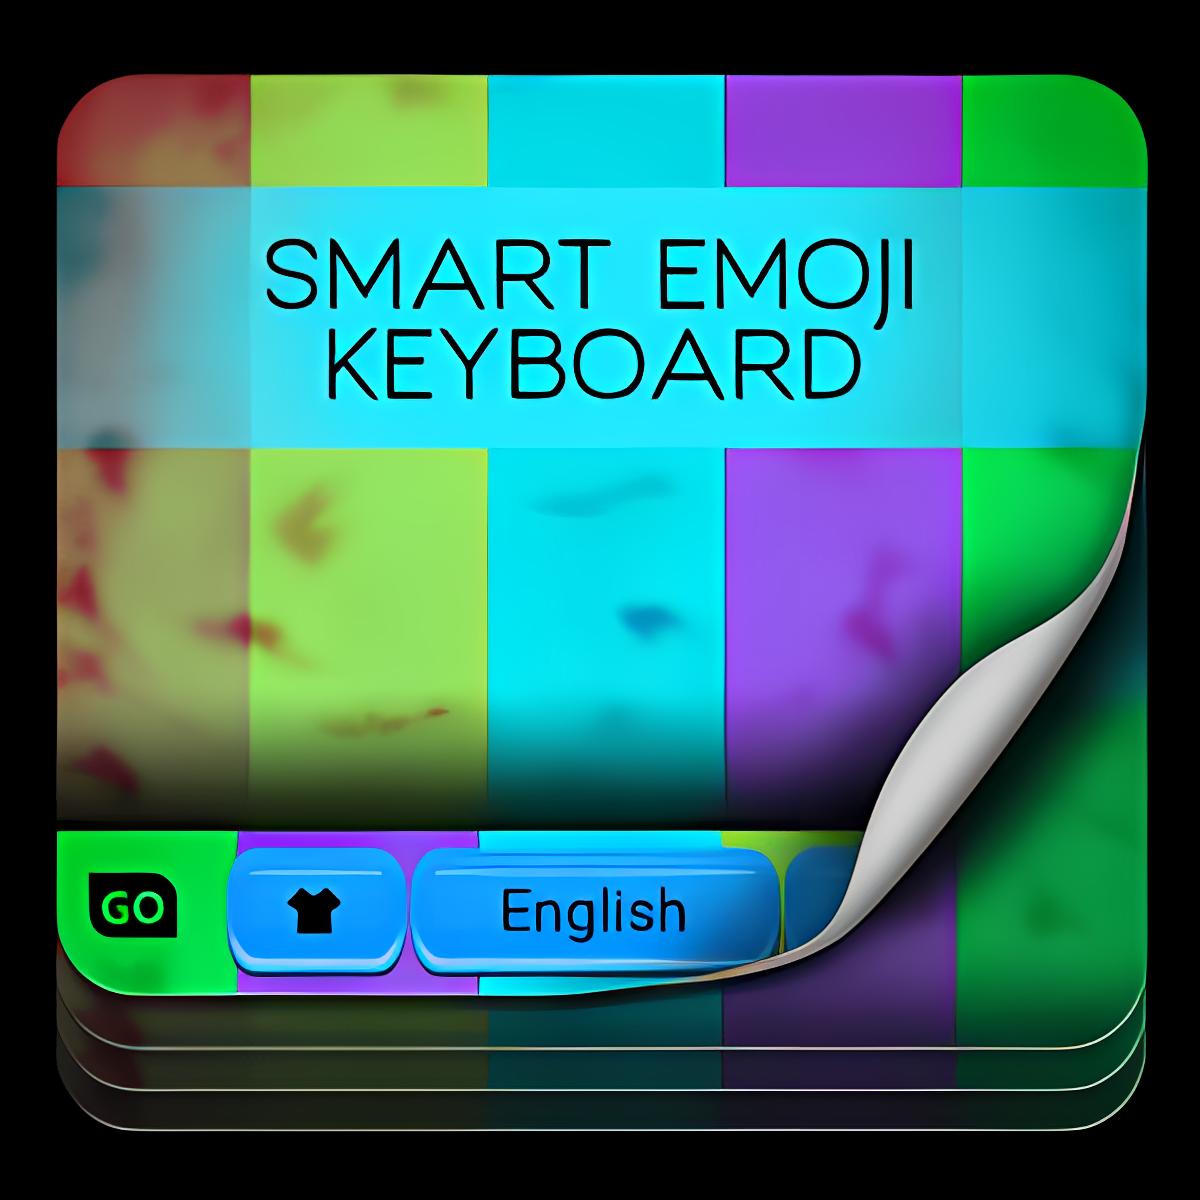 Inteligente Emoji teclado 2.56.56.1